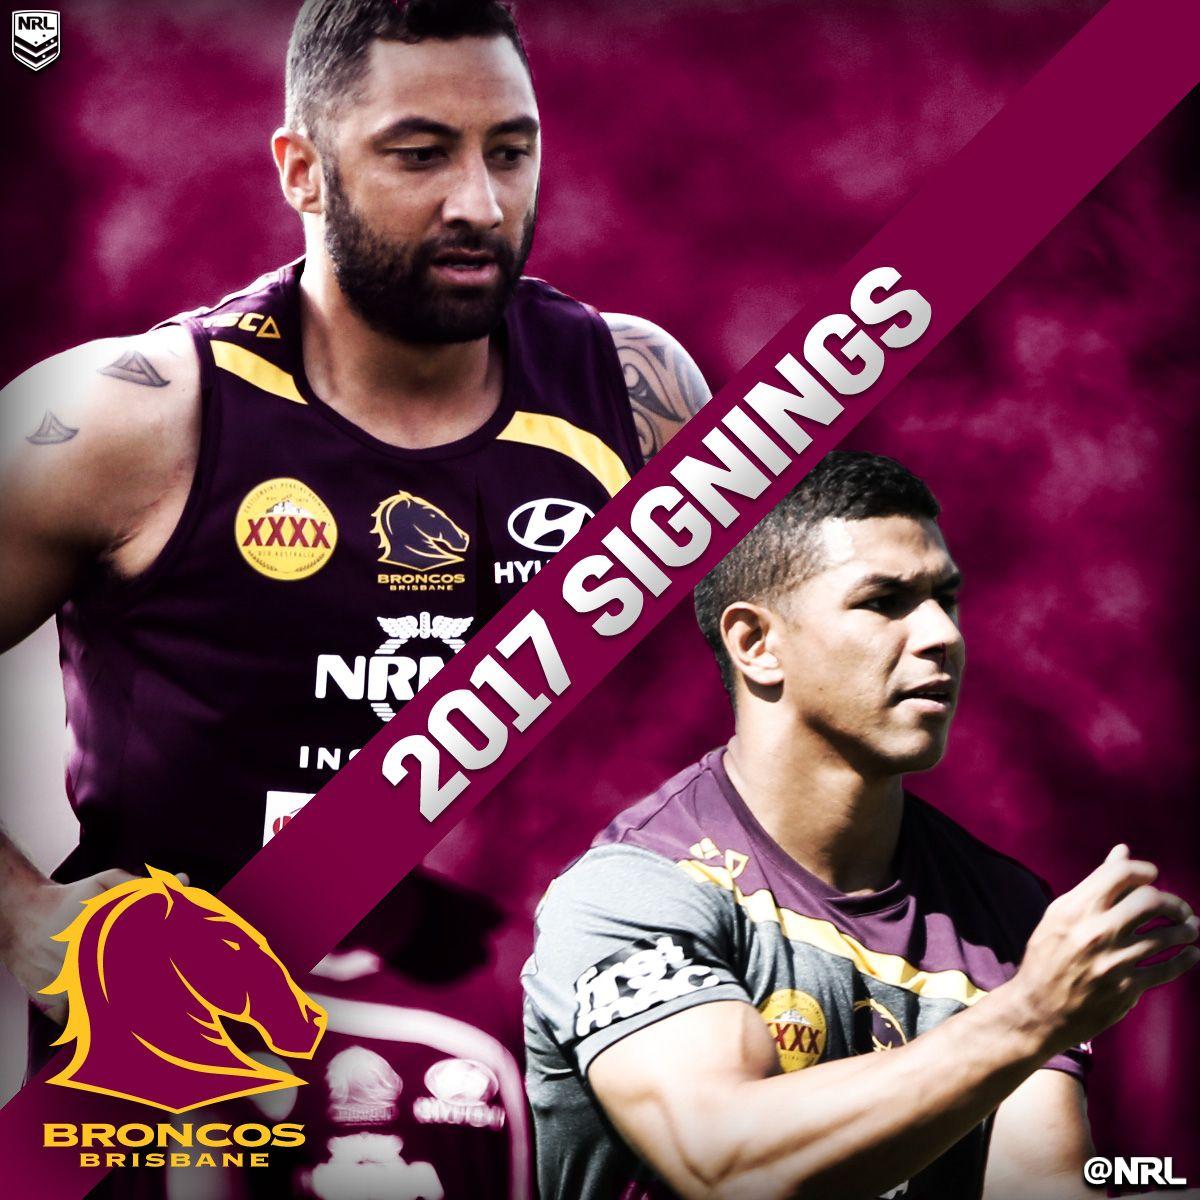 2017 Brisbane Broncos NRLRecruits. NRL 2017 Player